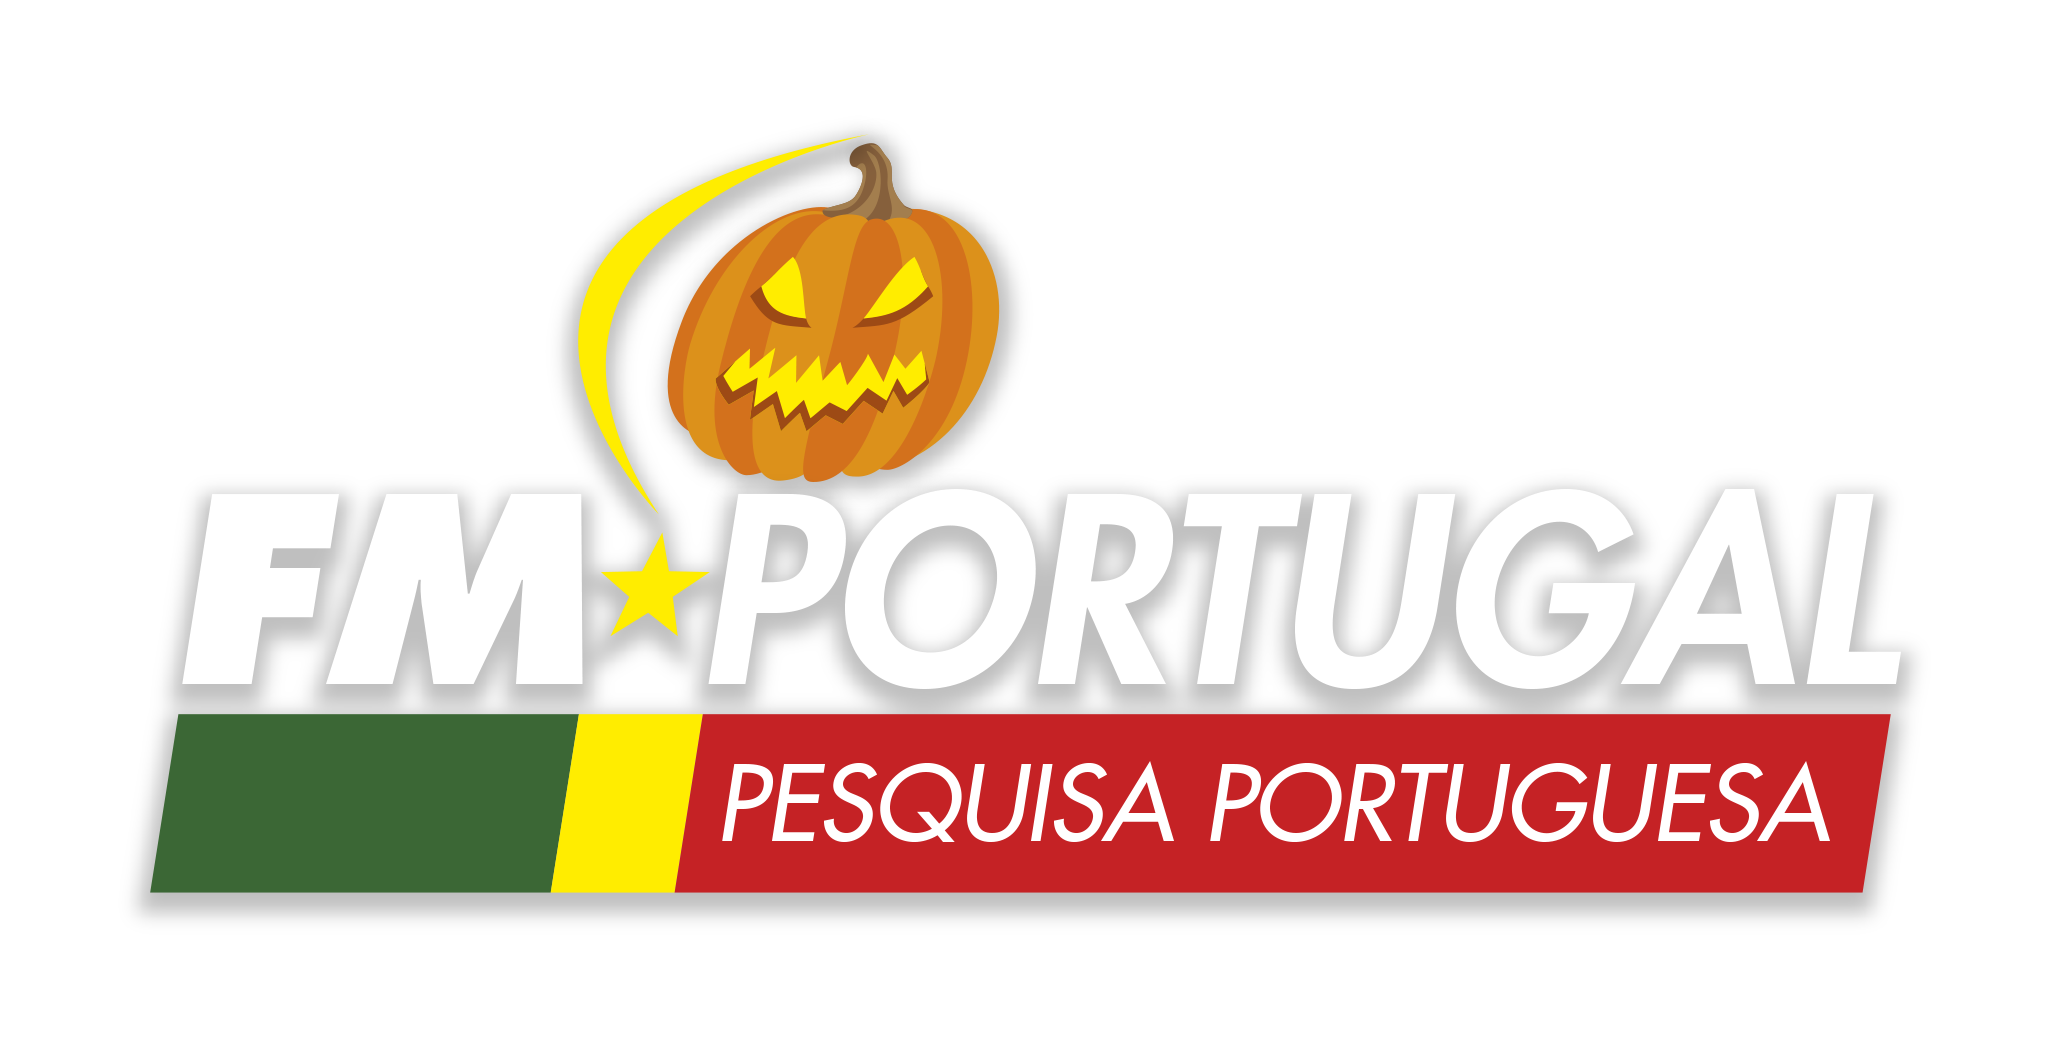 FM Portugal